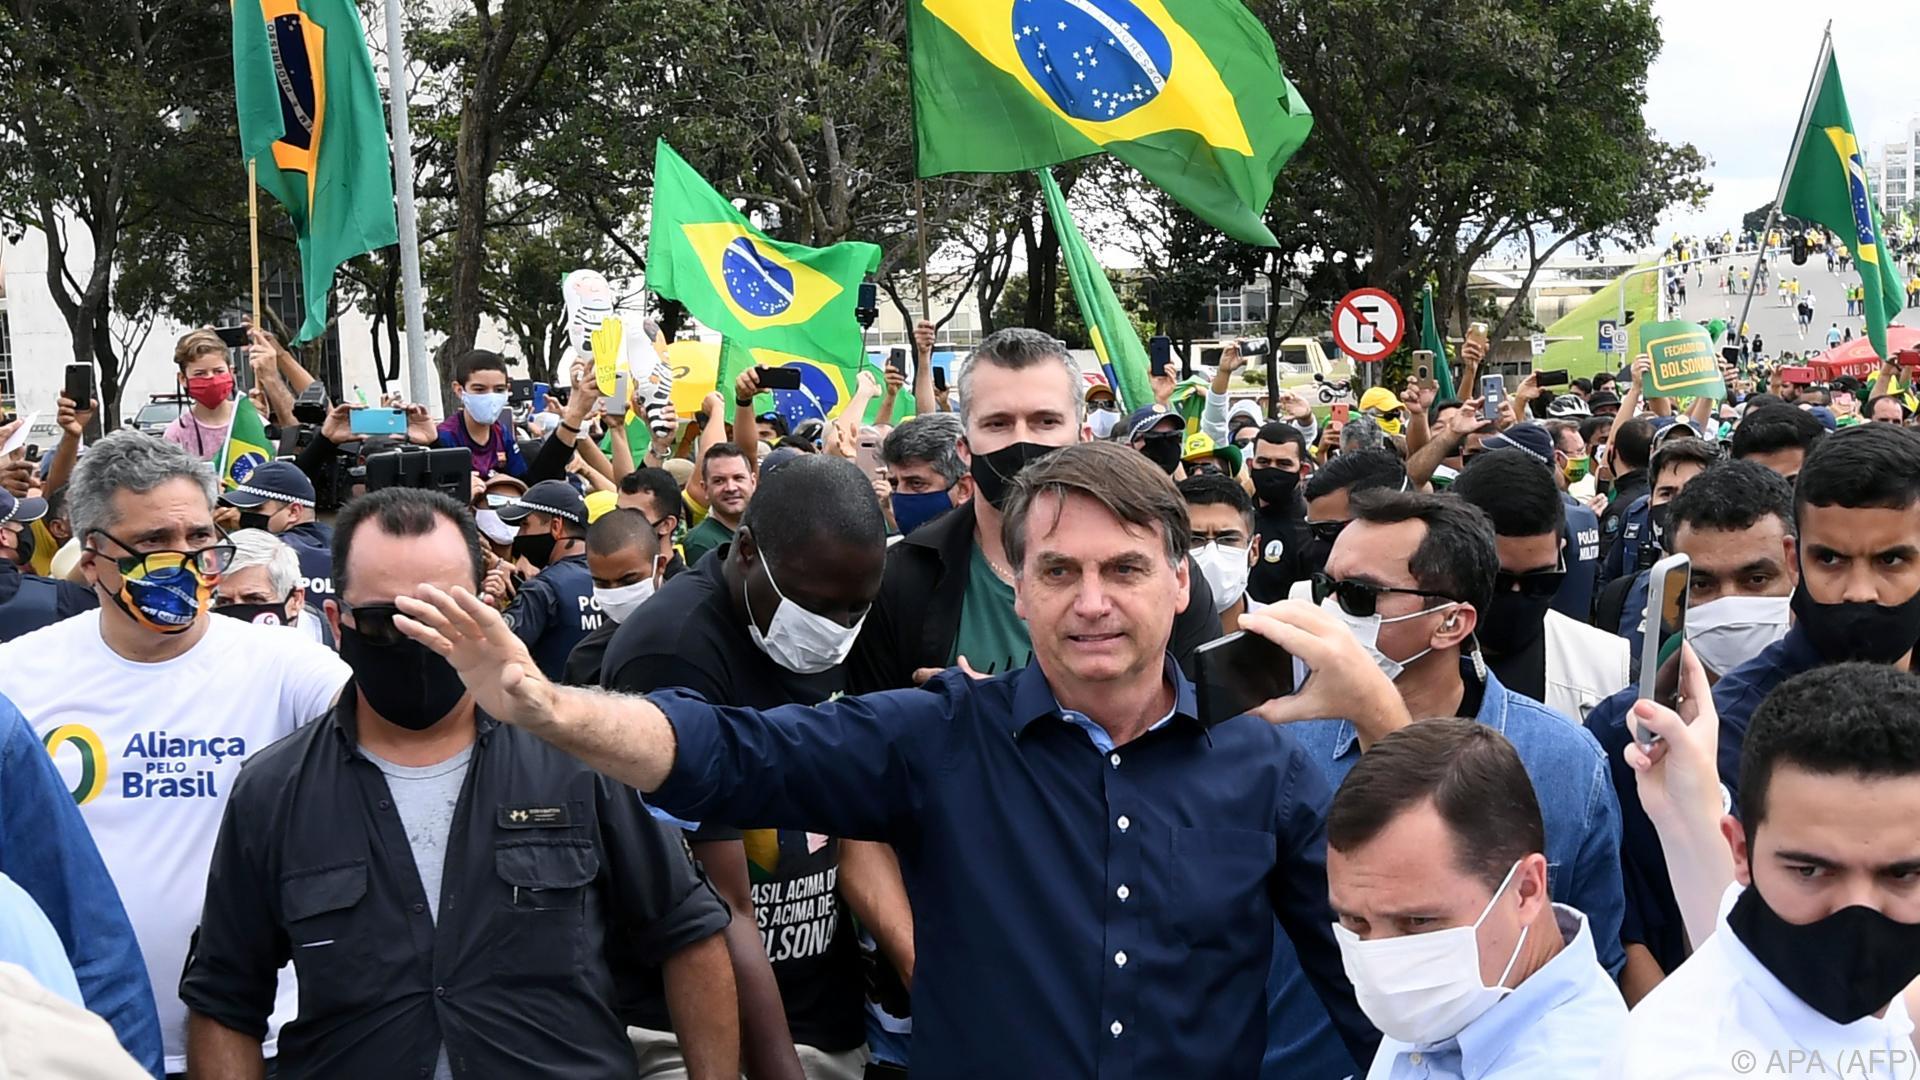 Brasiliens Präsident Bolsonaro positiv auf Covid-19 getestet